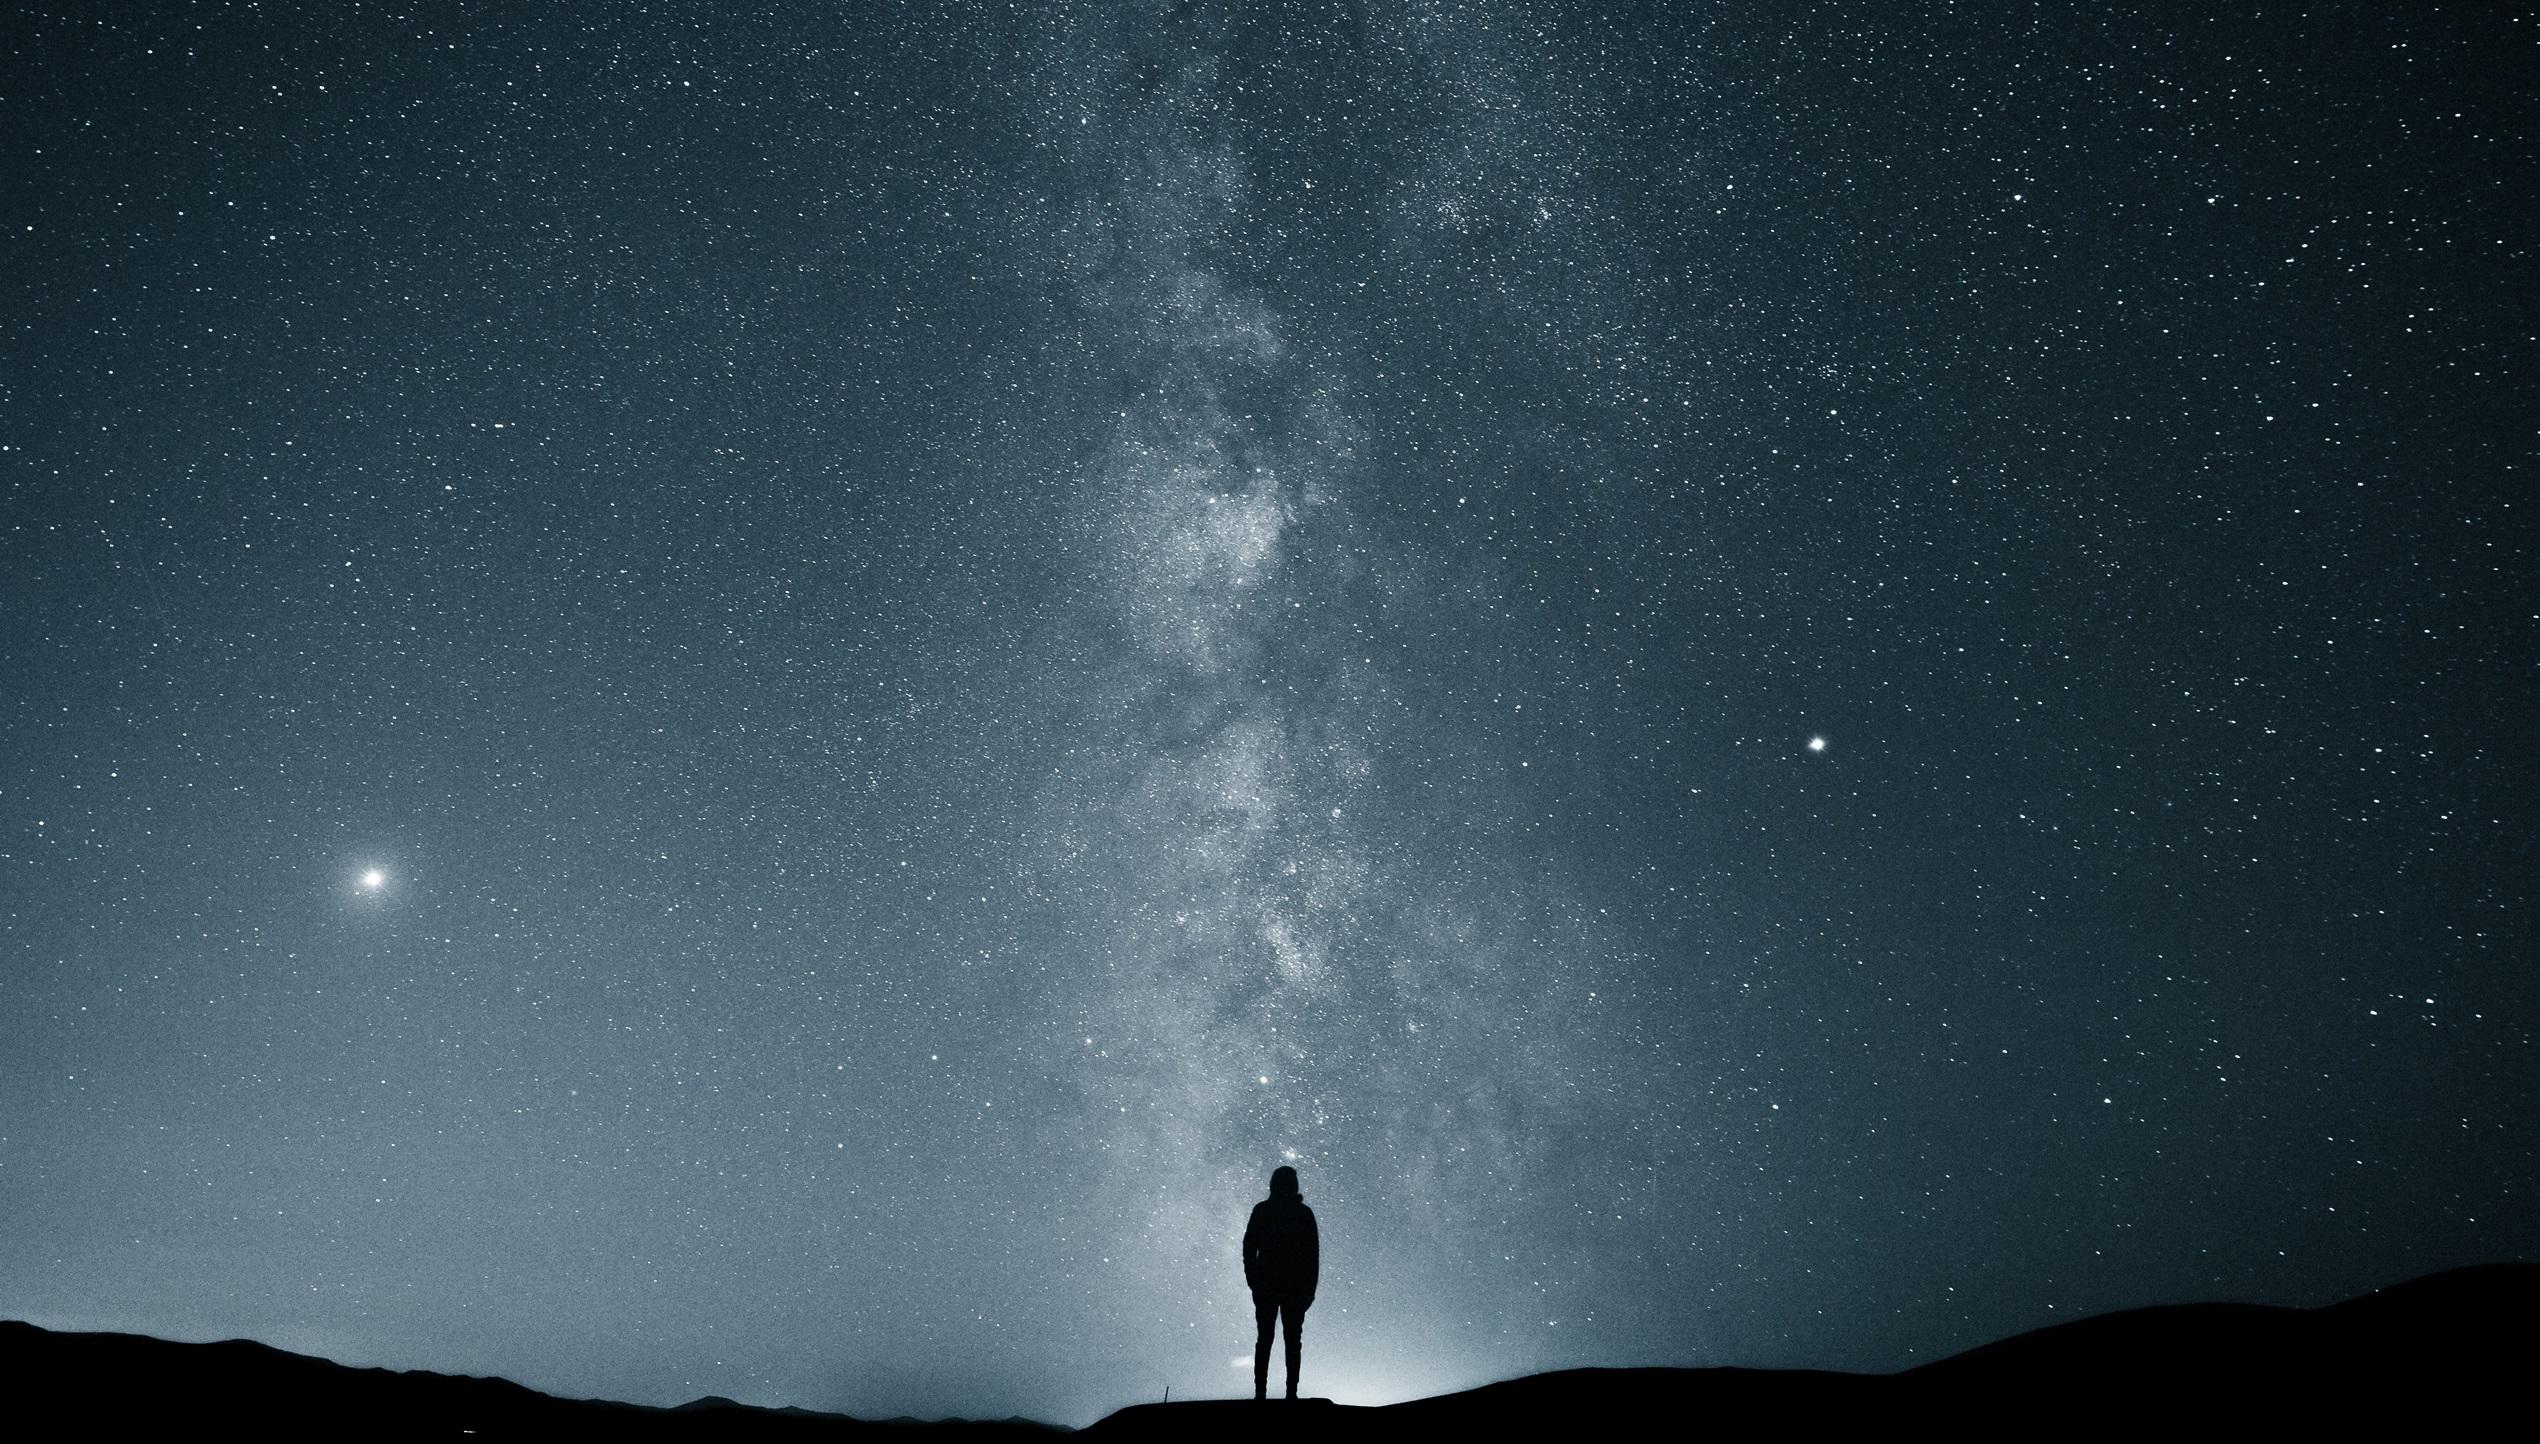 Wallpaper stars milky way alone landscape night sky - Space night sky wallpaper ...